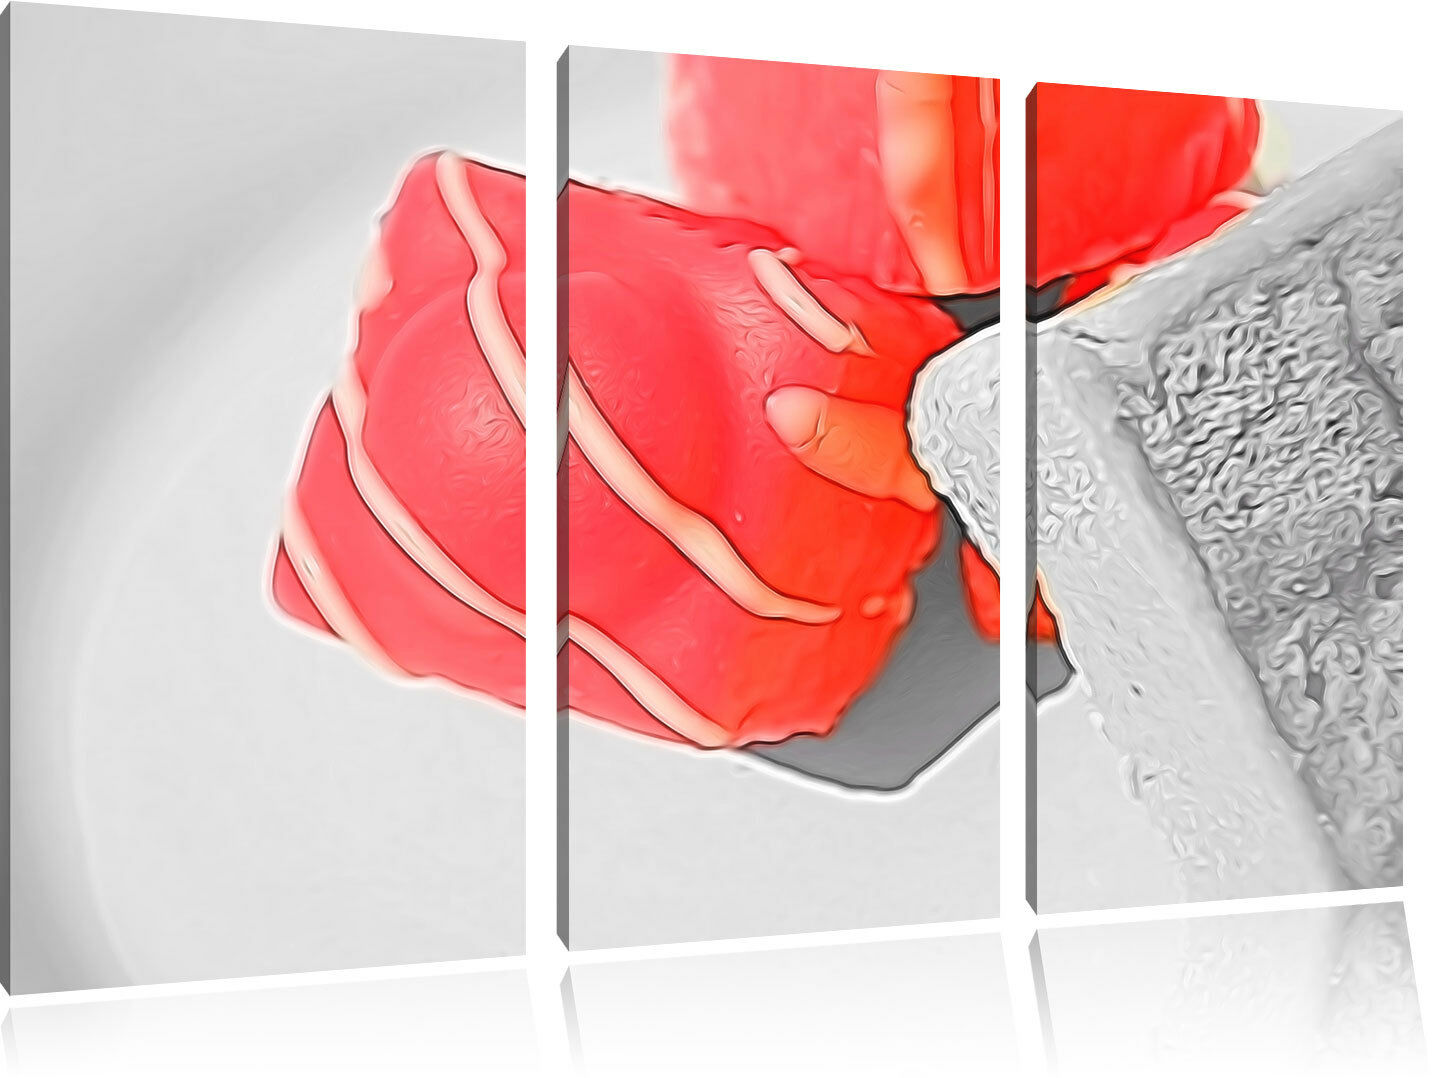 Appetitosa caramelle 3-Divisorio Tela Tela Tela Decorazione stampa d'arte 6fcfc5